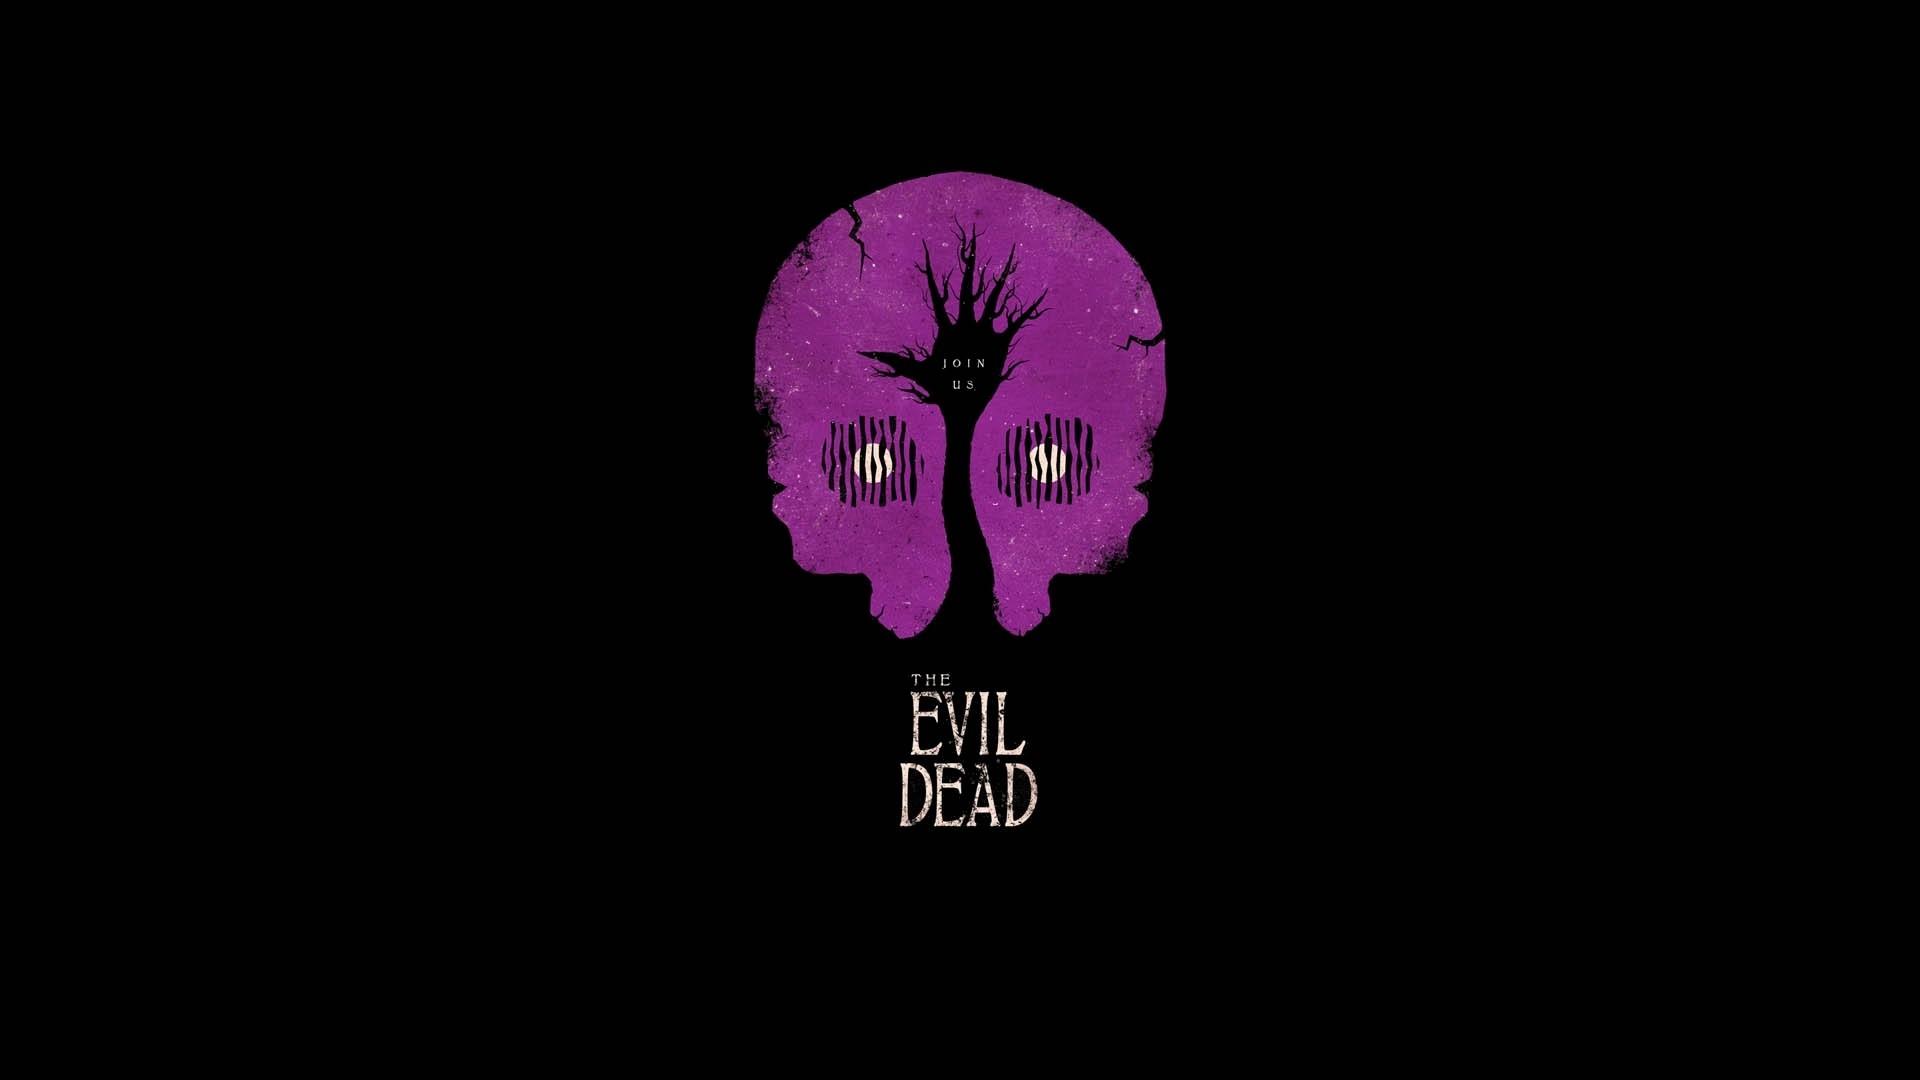 Evil Dead, Minimalism, Artwork, Movies, Black, Simple Wallpapers HD /  Desktop and Mobile Backgrounds